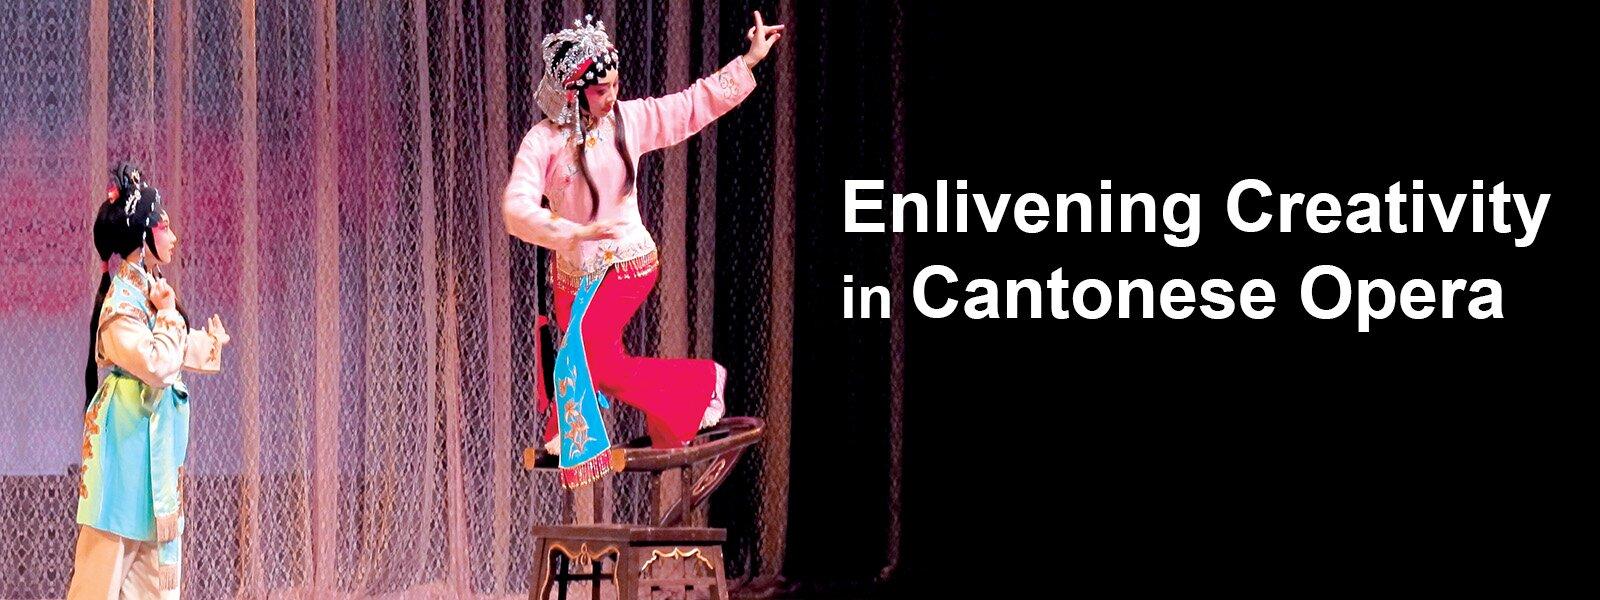 Enlivening Creativity in Cantonese Opera